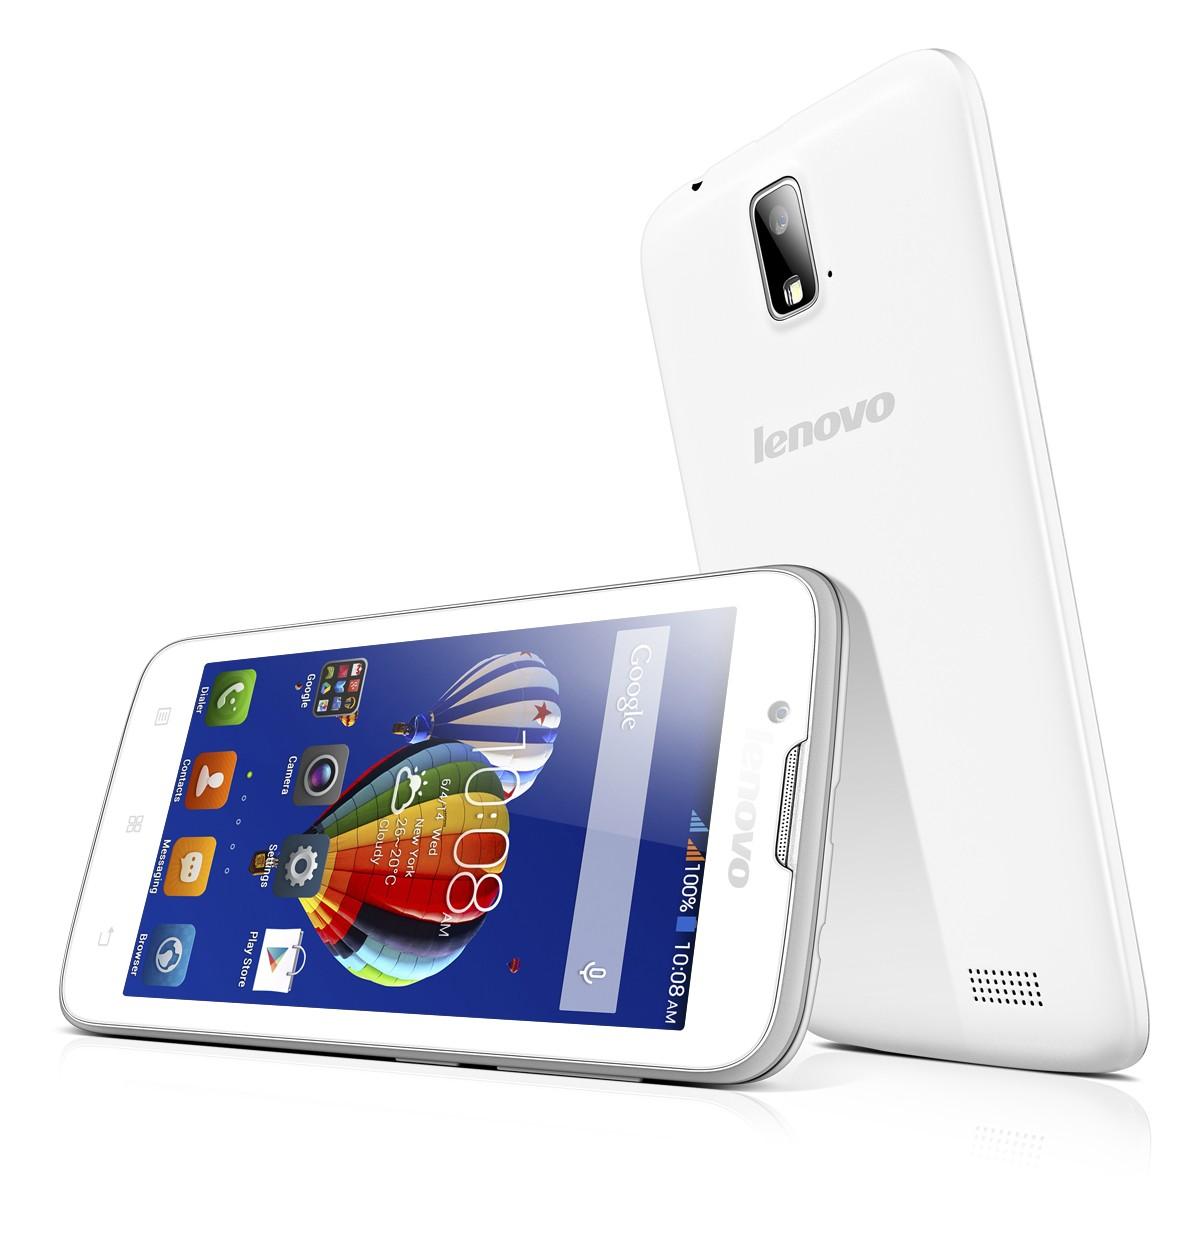 lenovo A328 - Lenovo A328: smartphone phổ thông giá 2,3 triệu đồng